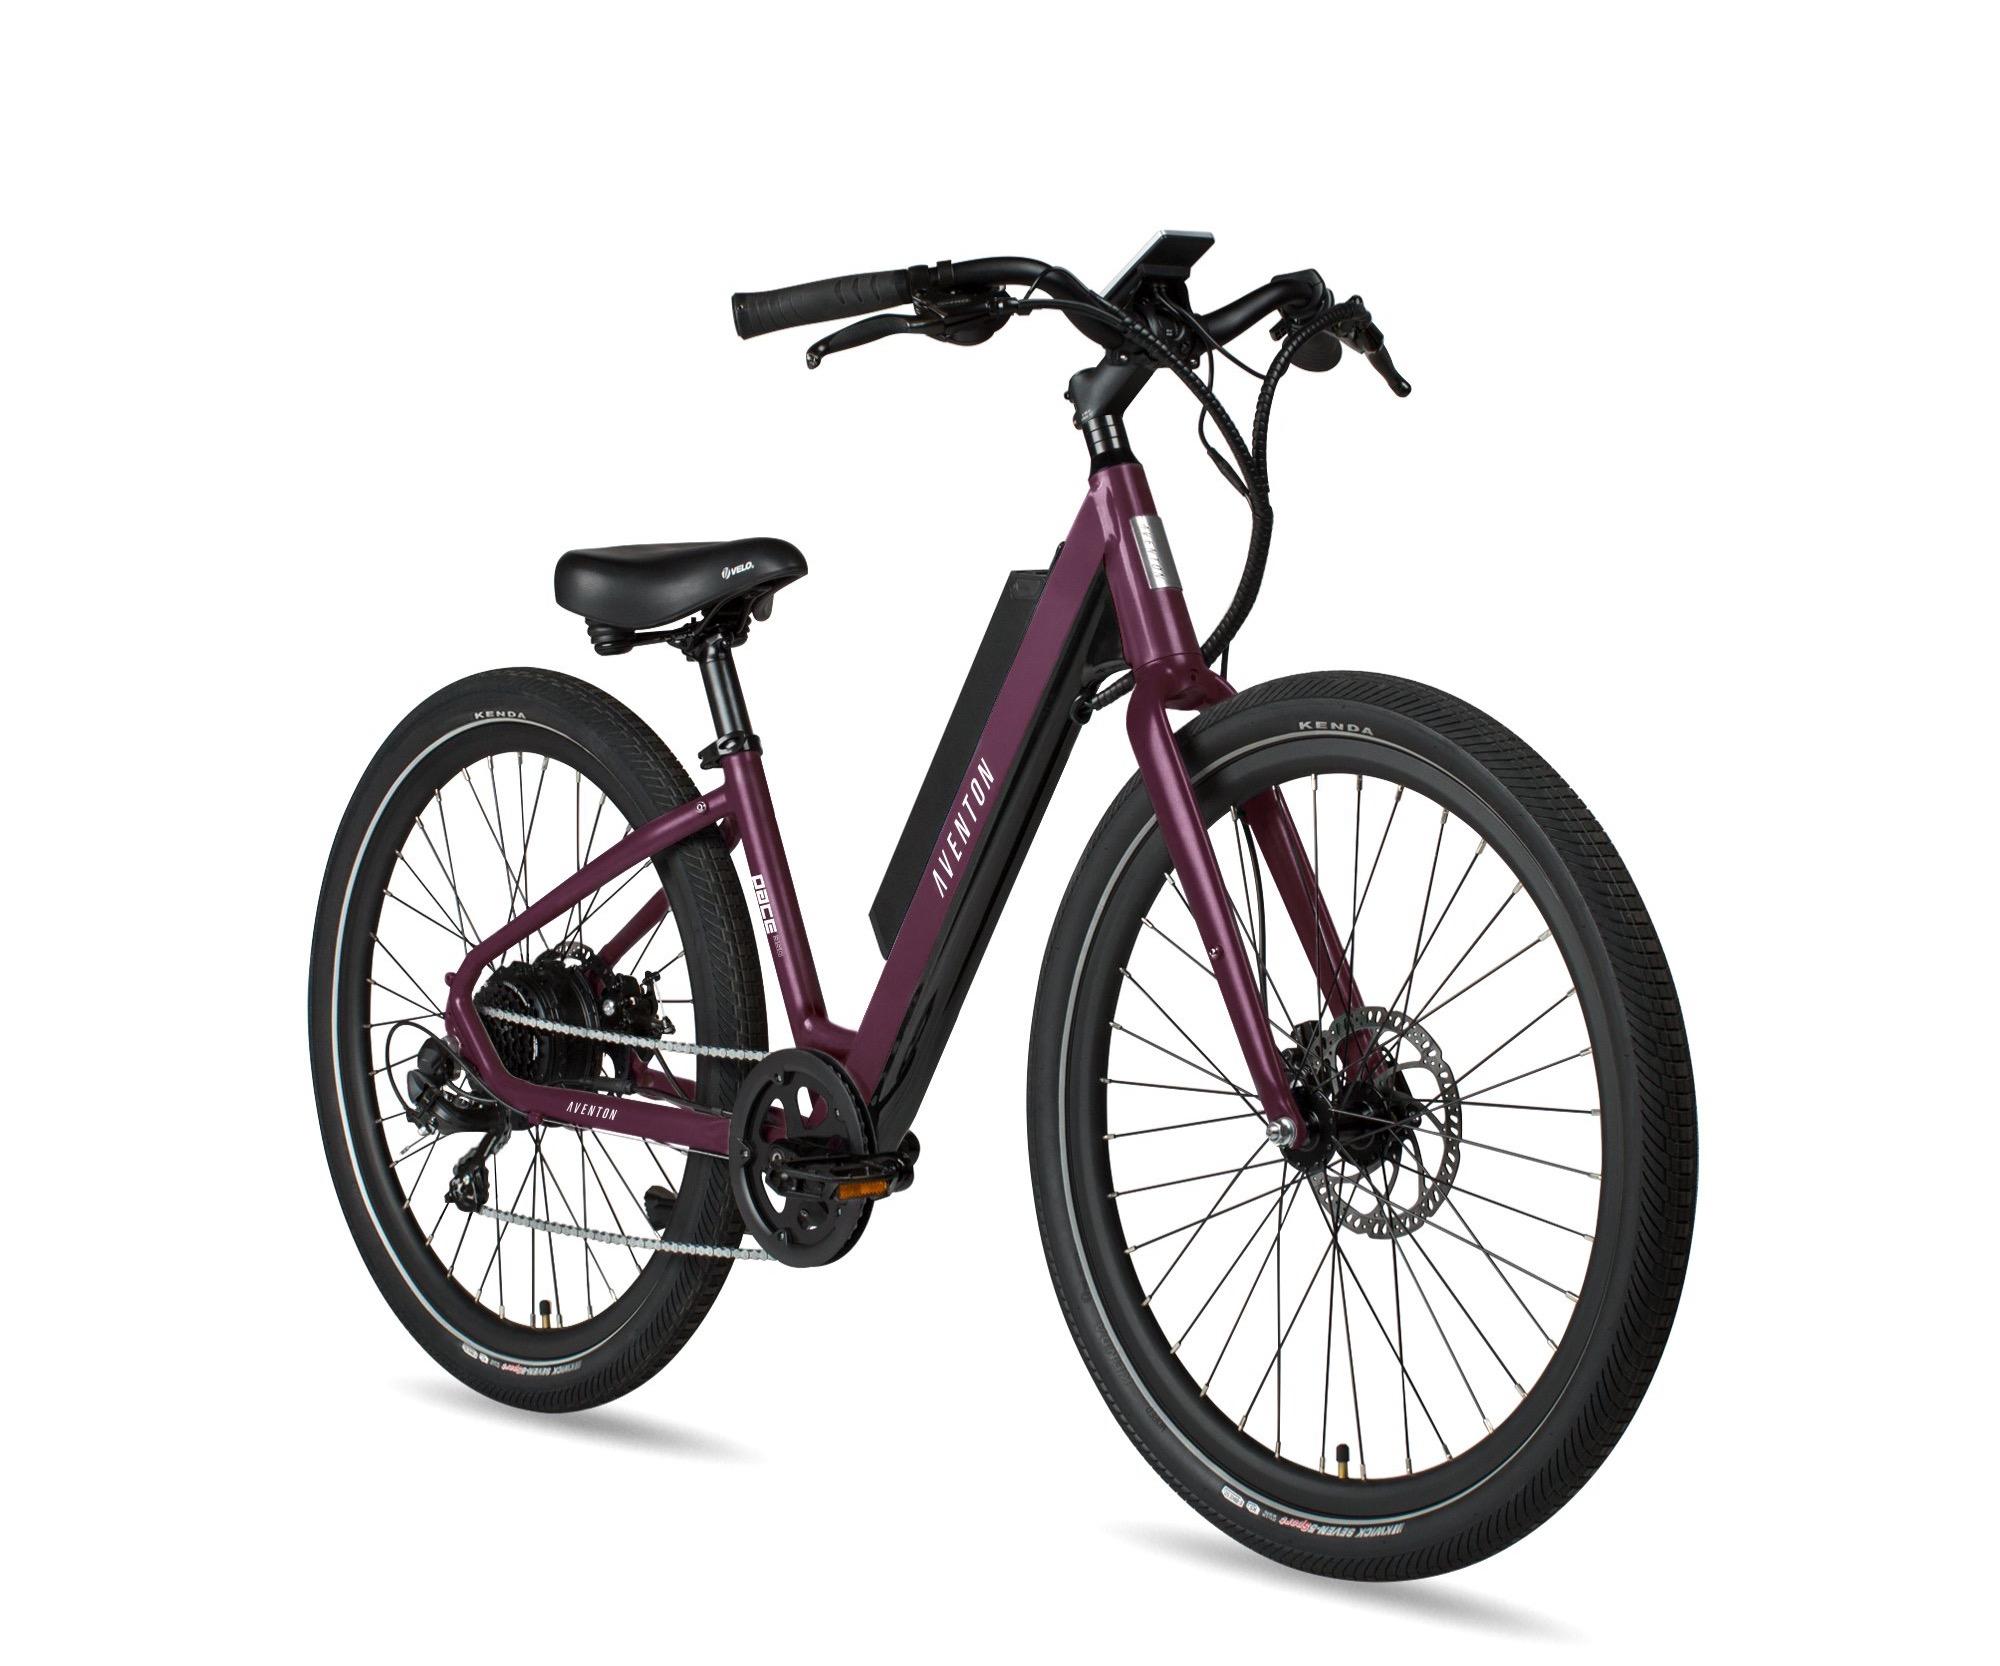 Aventon E-bikes, Pace 500 Step-Through